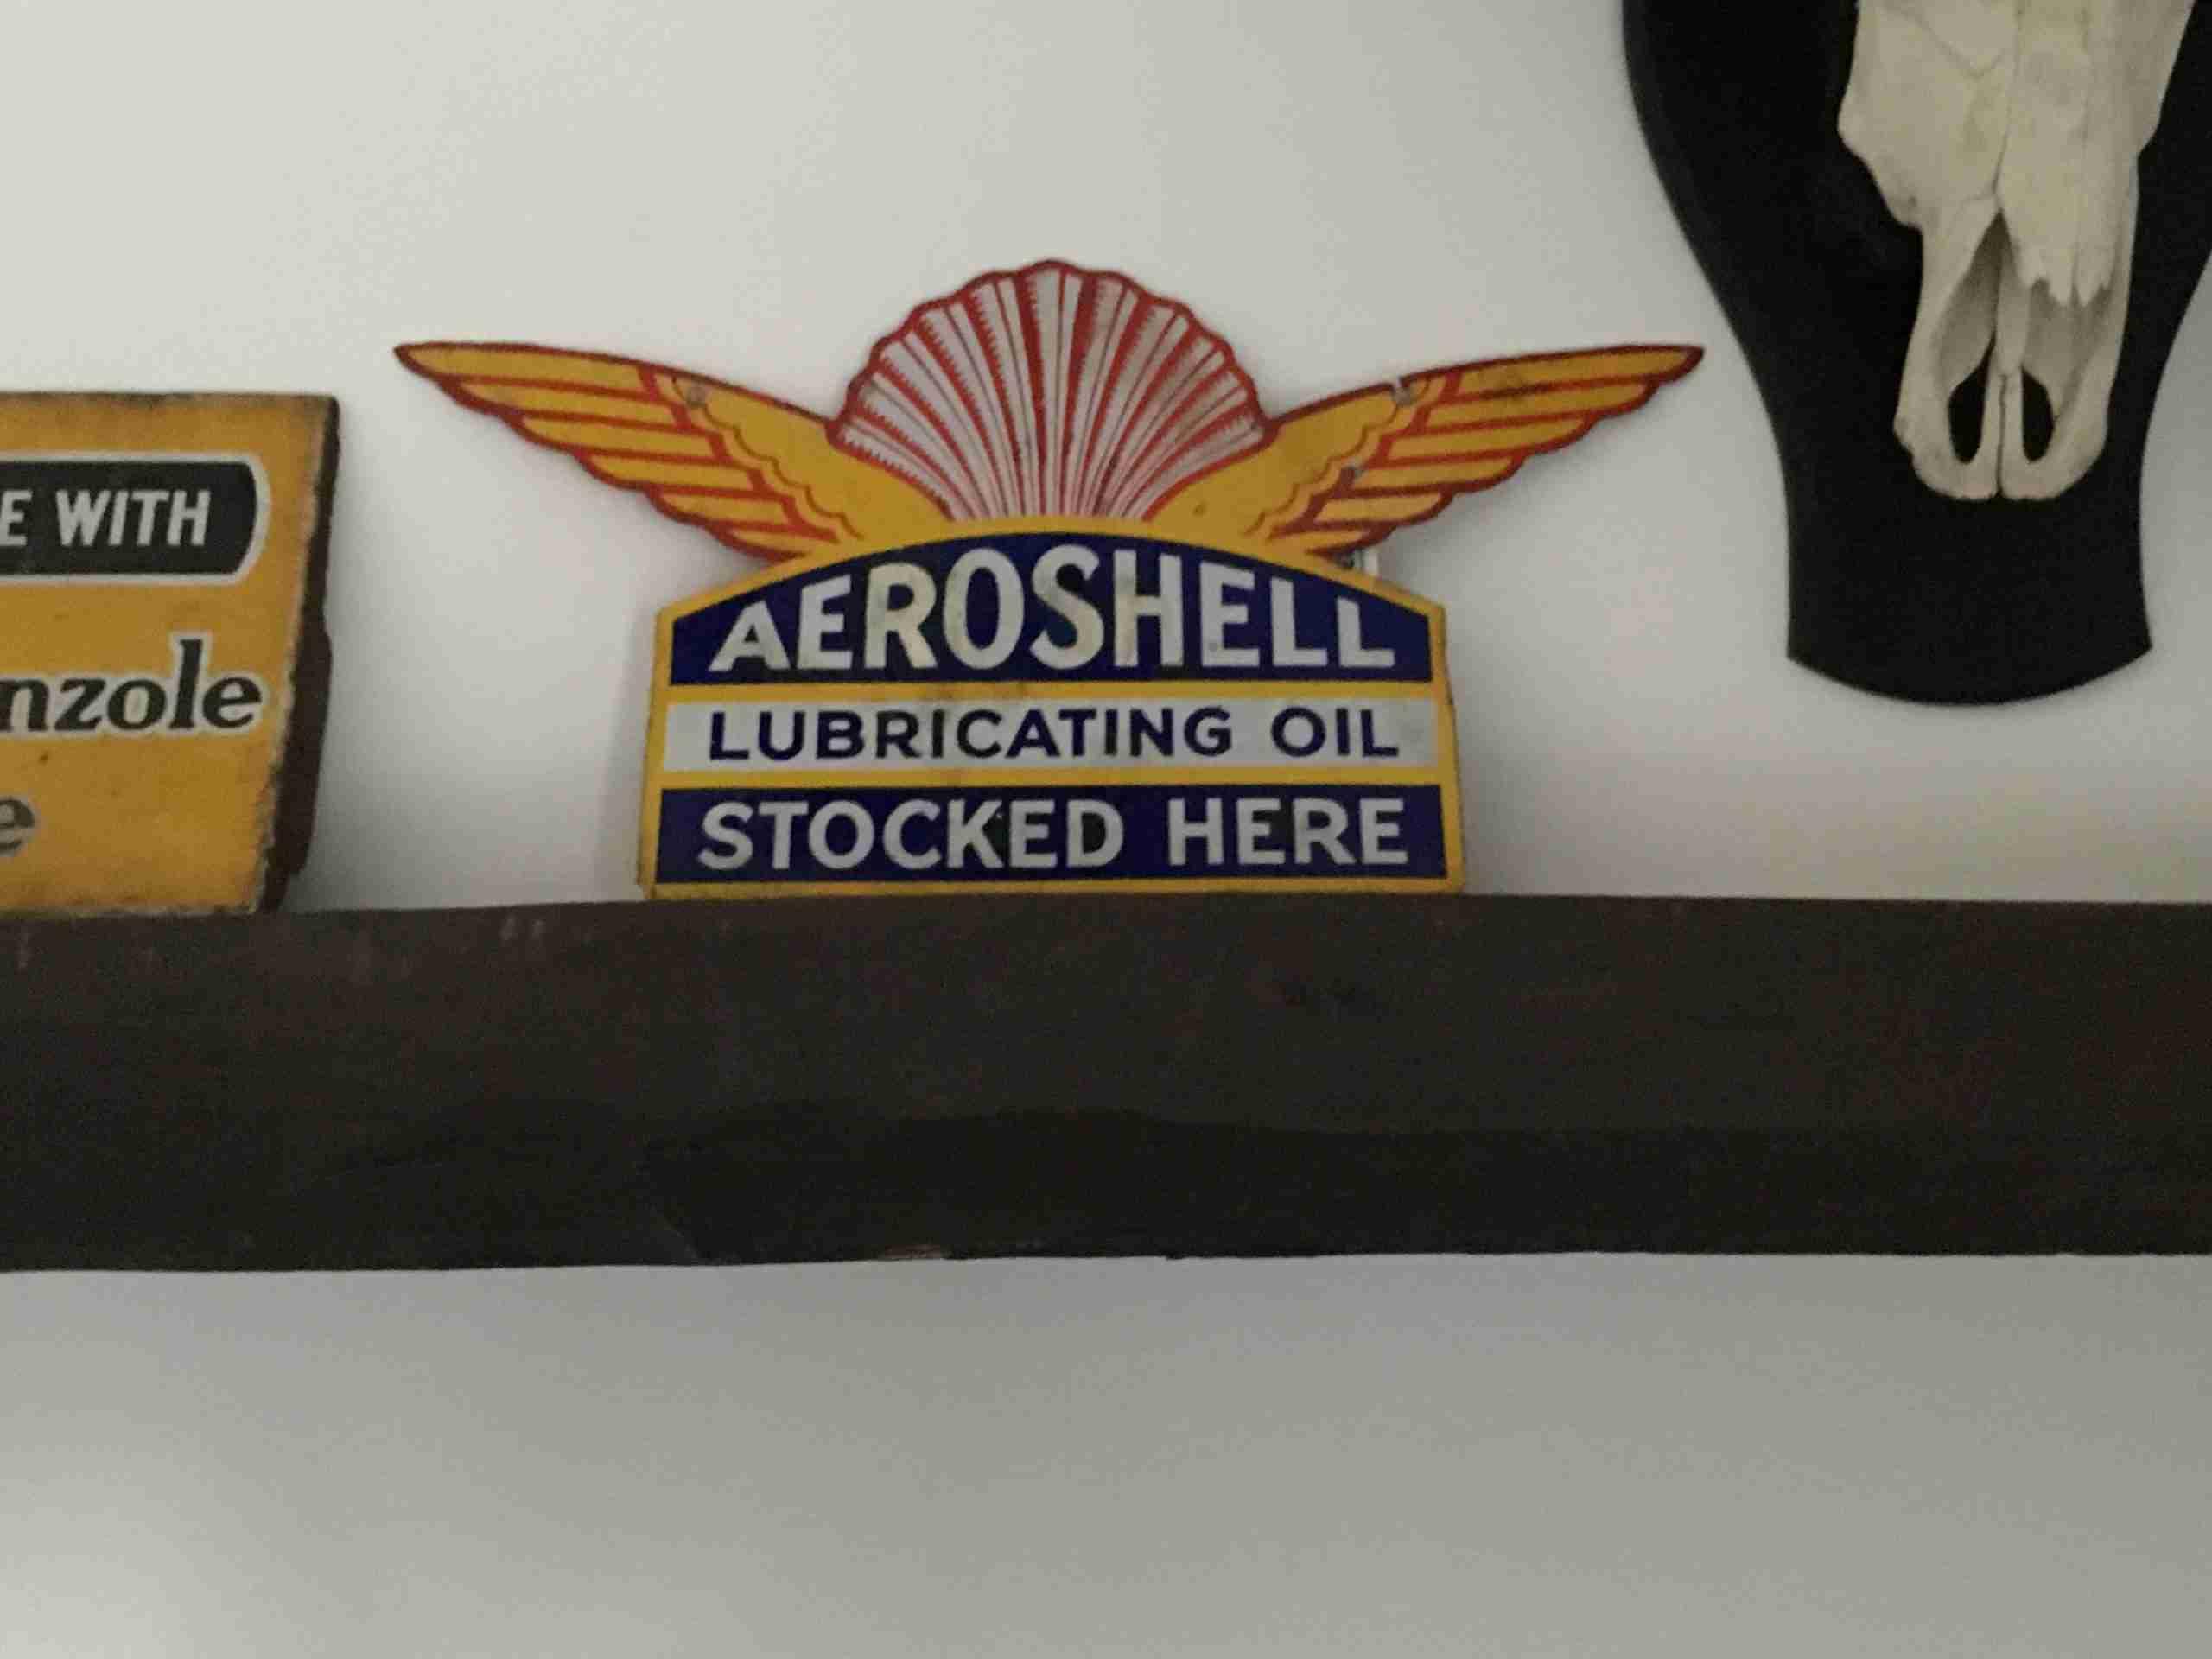 UK Restoration's Shell Aeroshell Enamel Sign